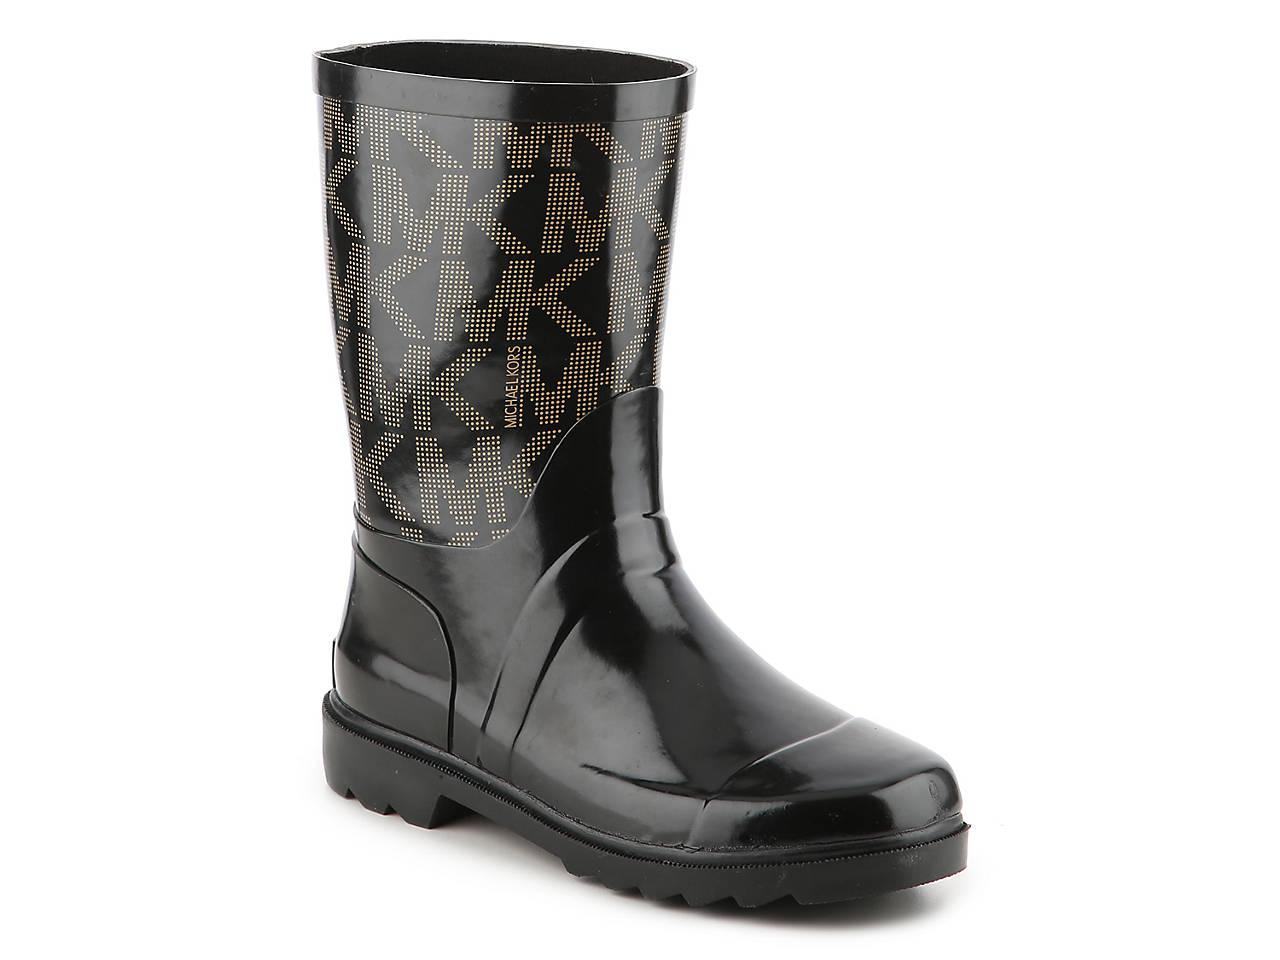 Daisy Toddler \u0026 Youth Rain Boot